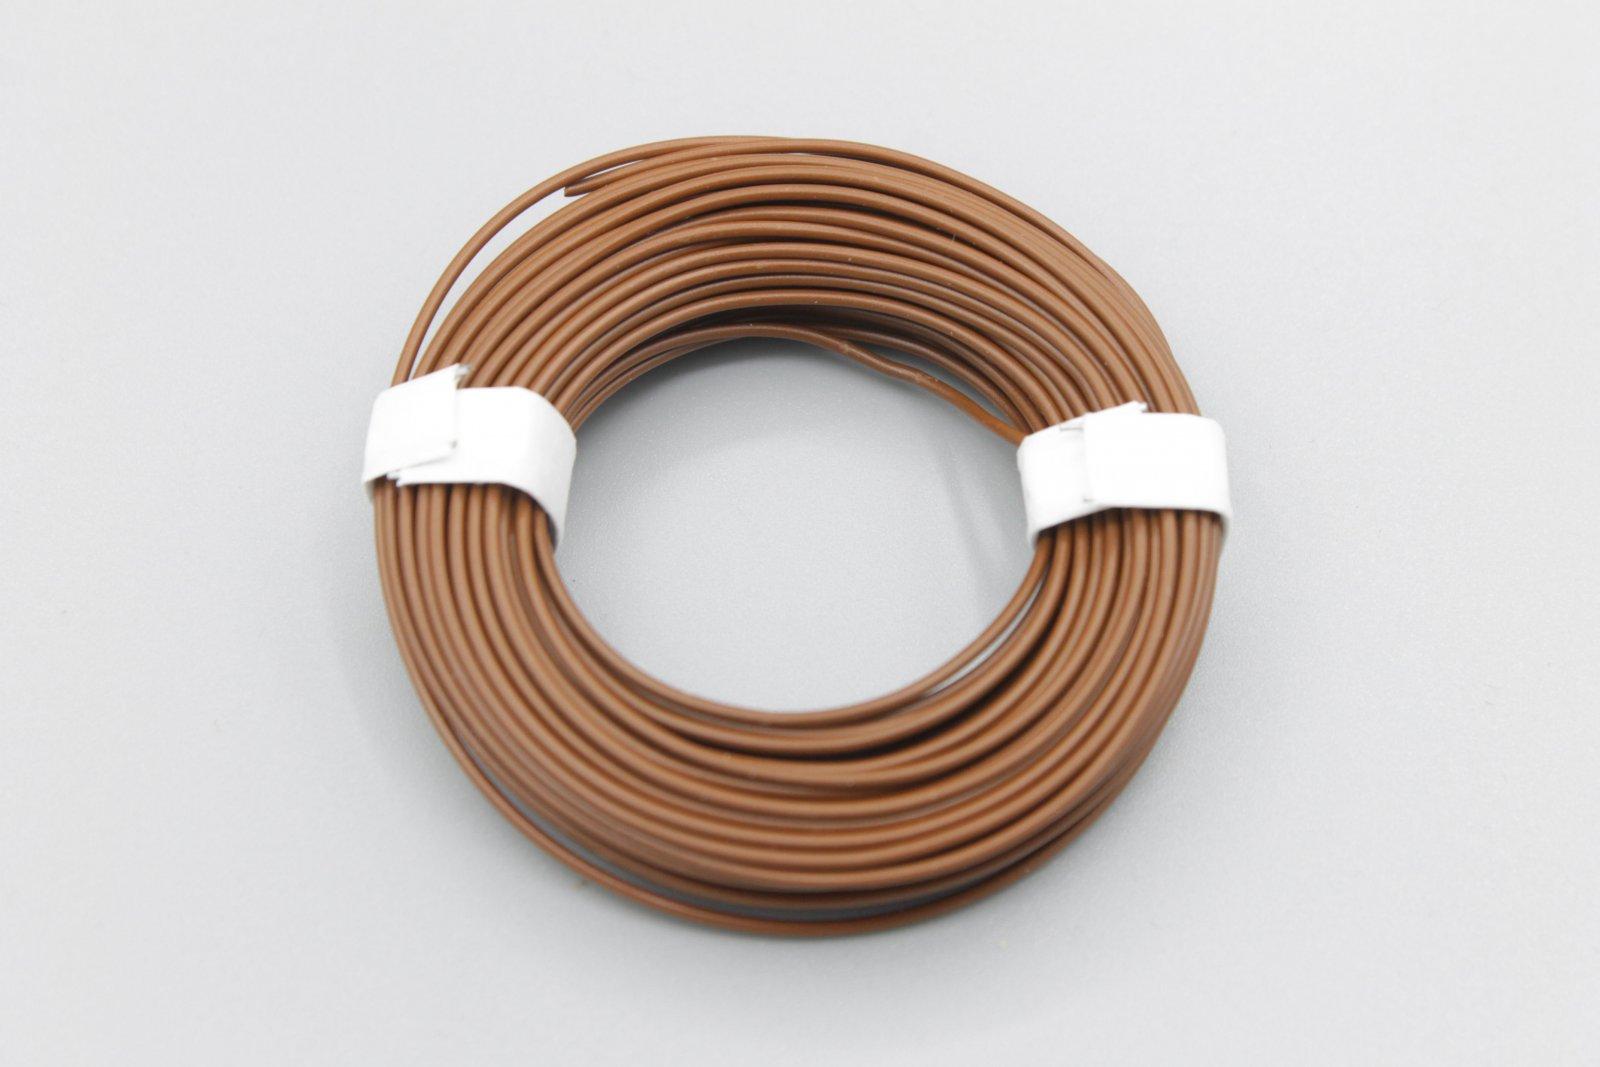 (0,13 €/m) 10 m Litze  braun 0,14 mm² Kupferlitze Schaltlitze Kabel